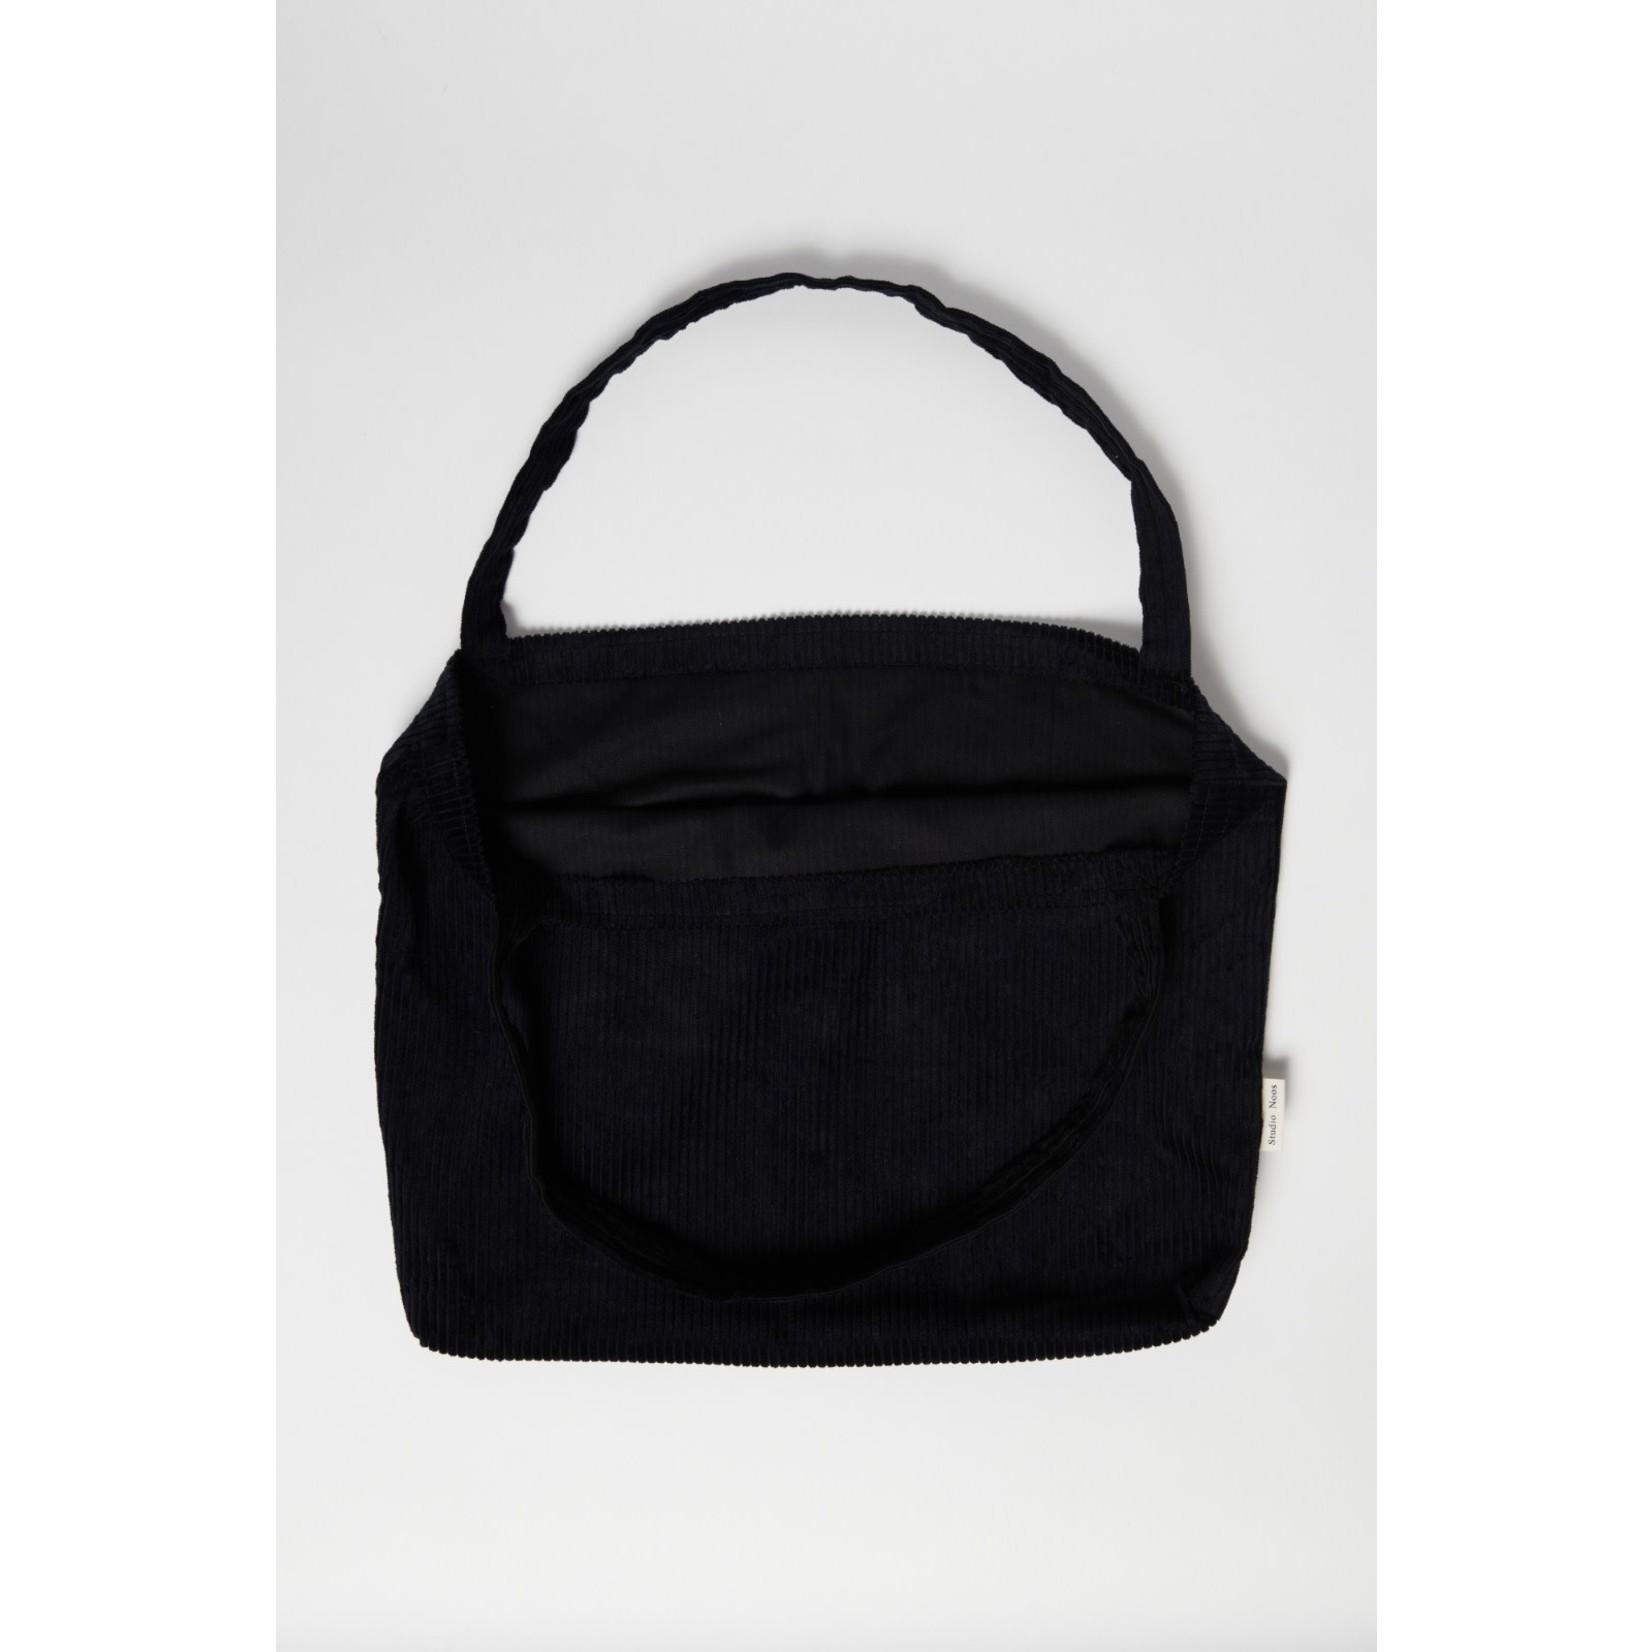 Studio Noos Black rib mom-bag   Studio Noos